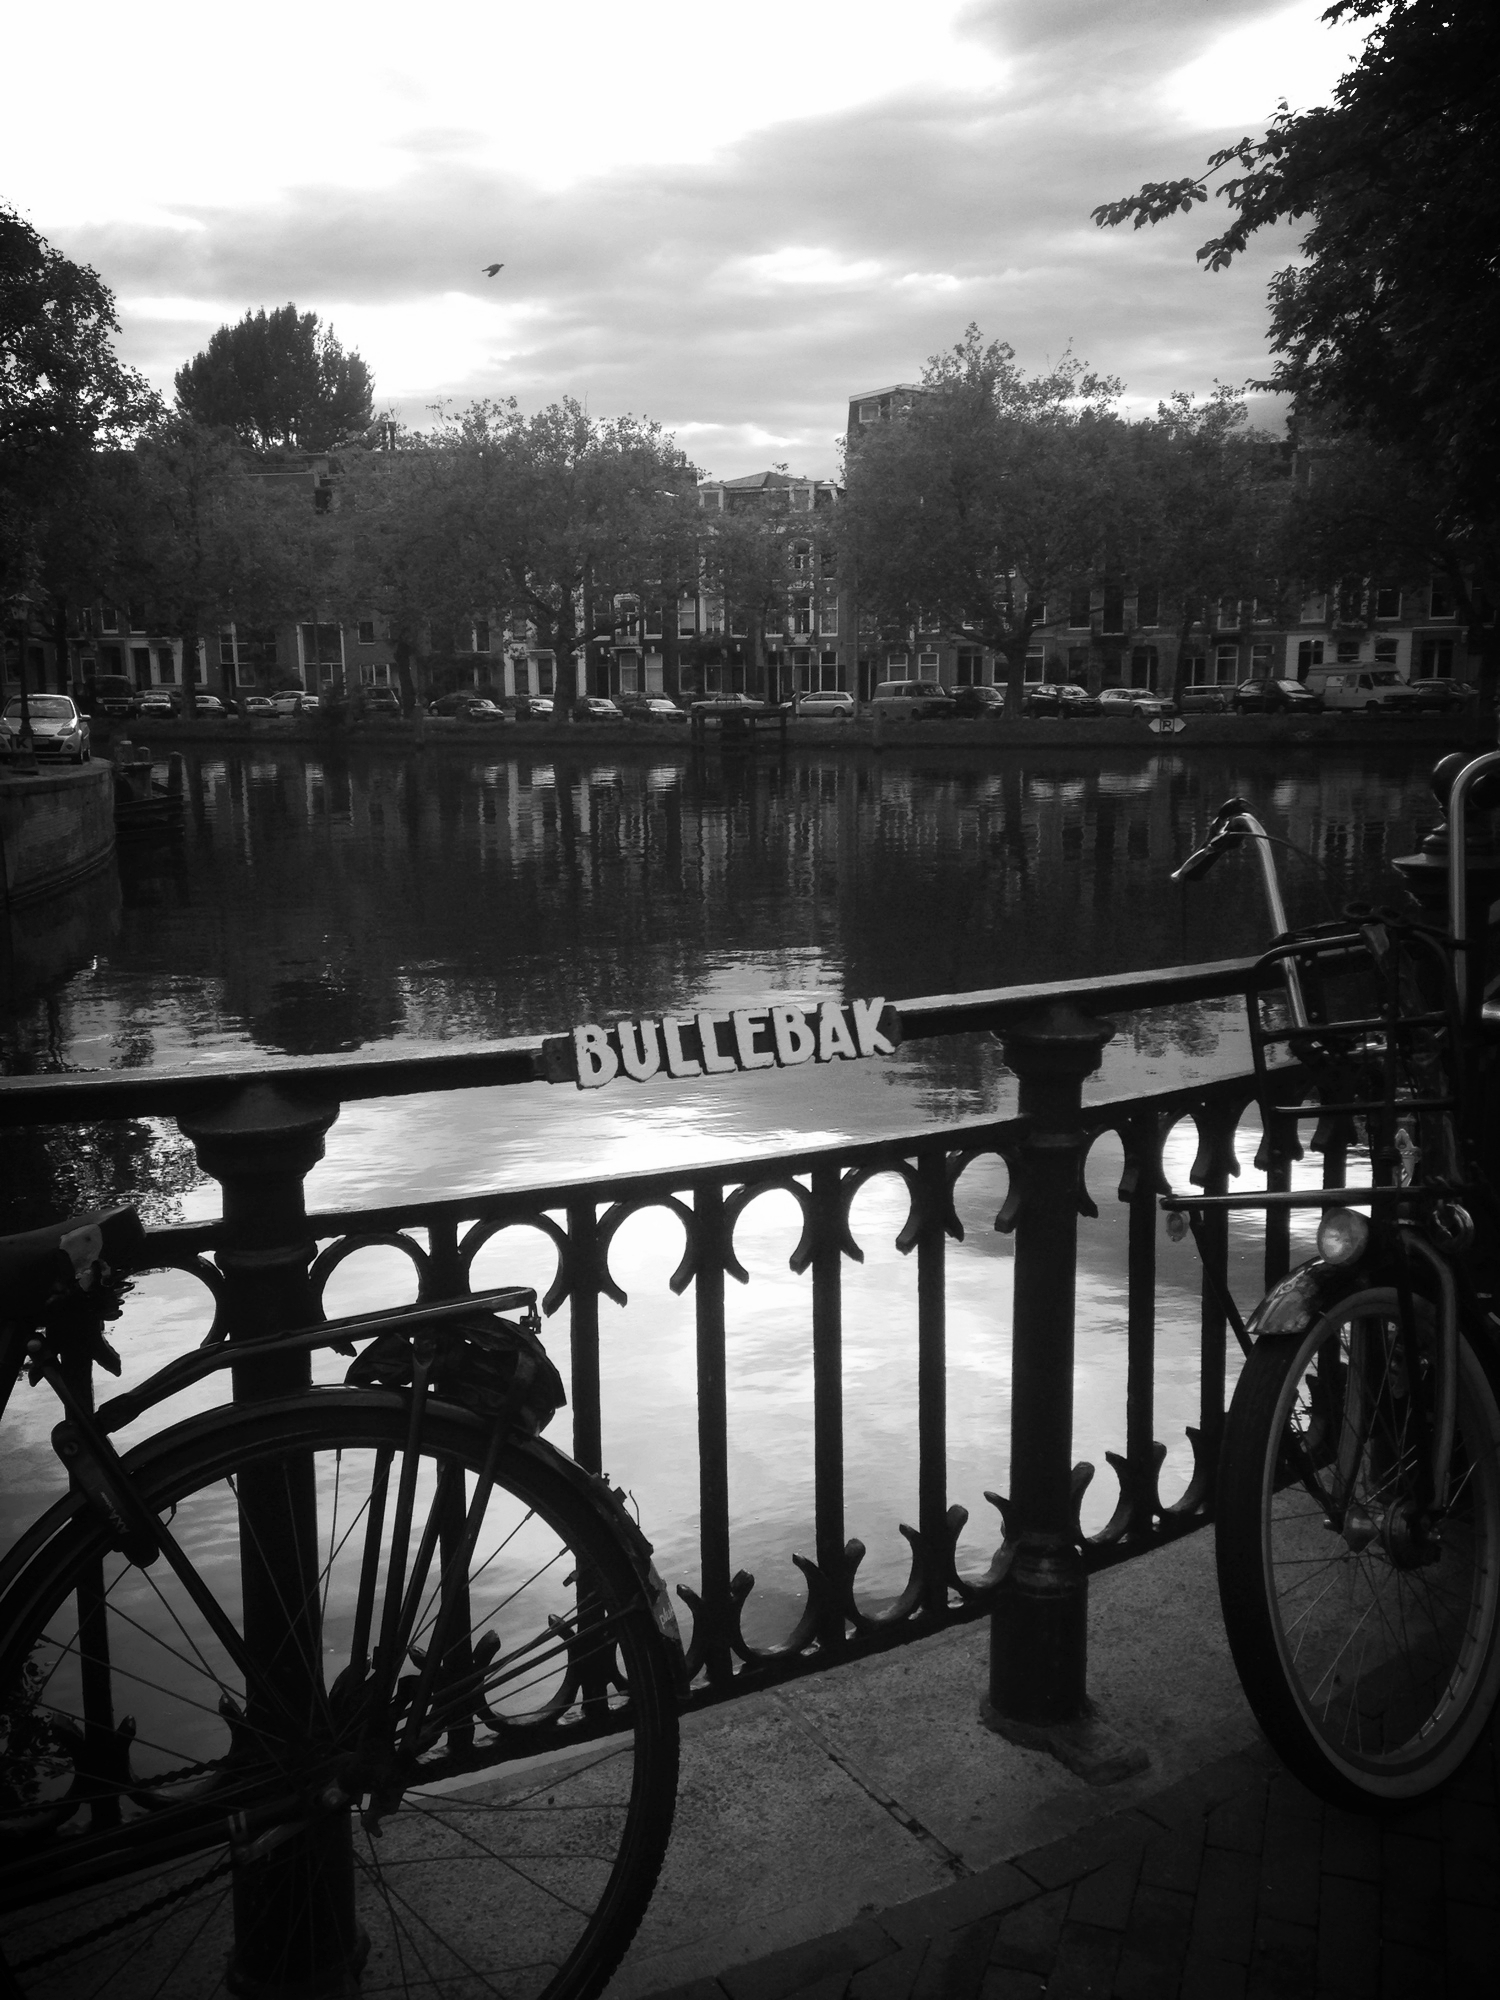 Bullebak brug, Amsterdam